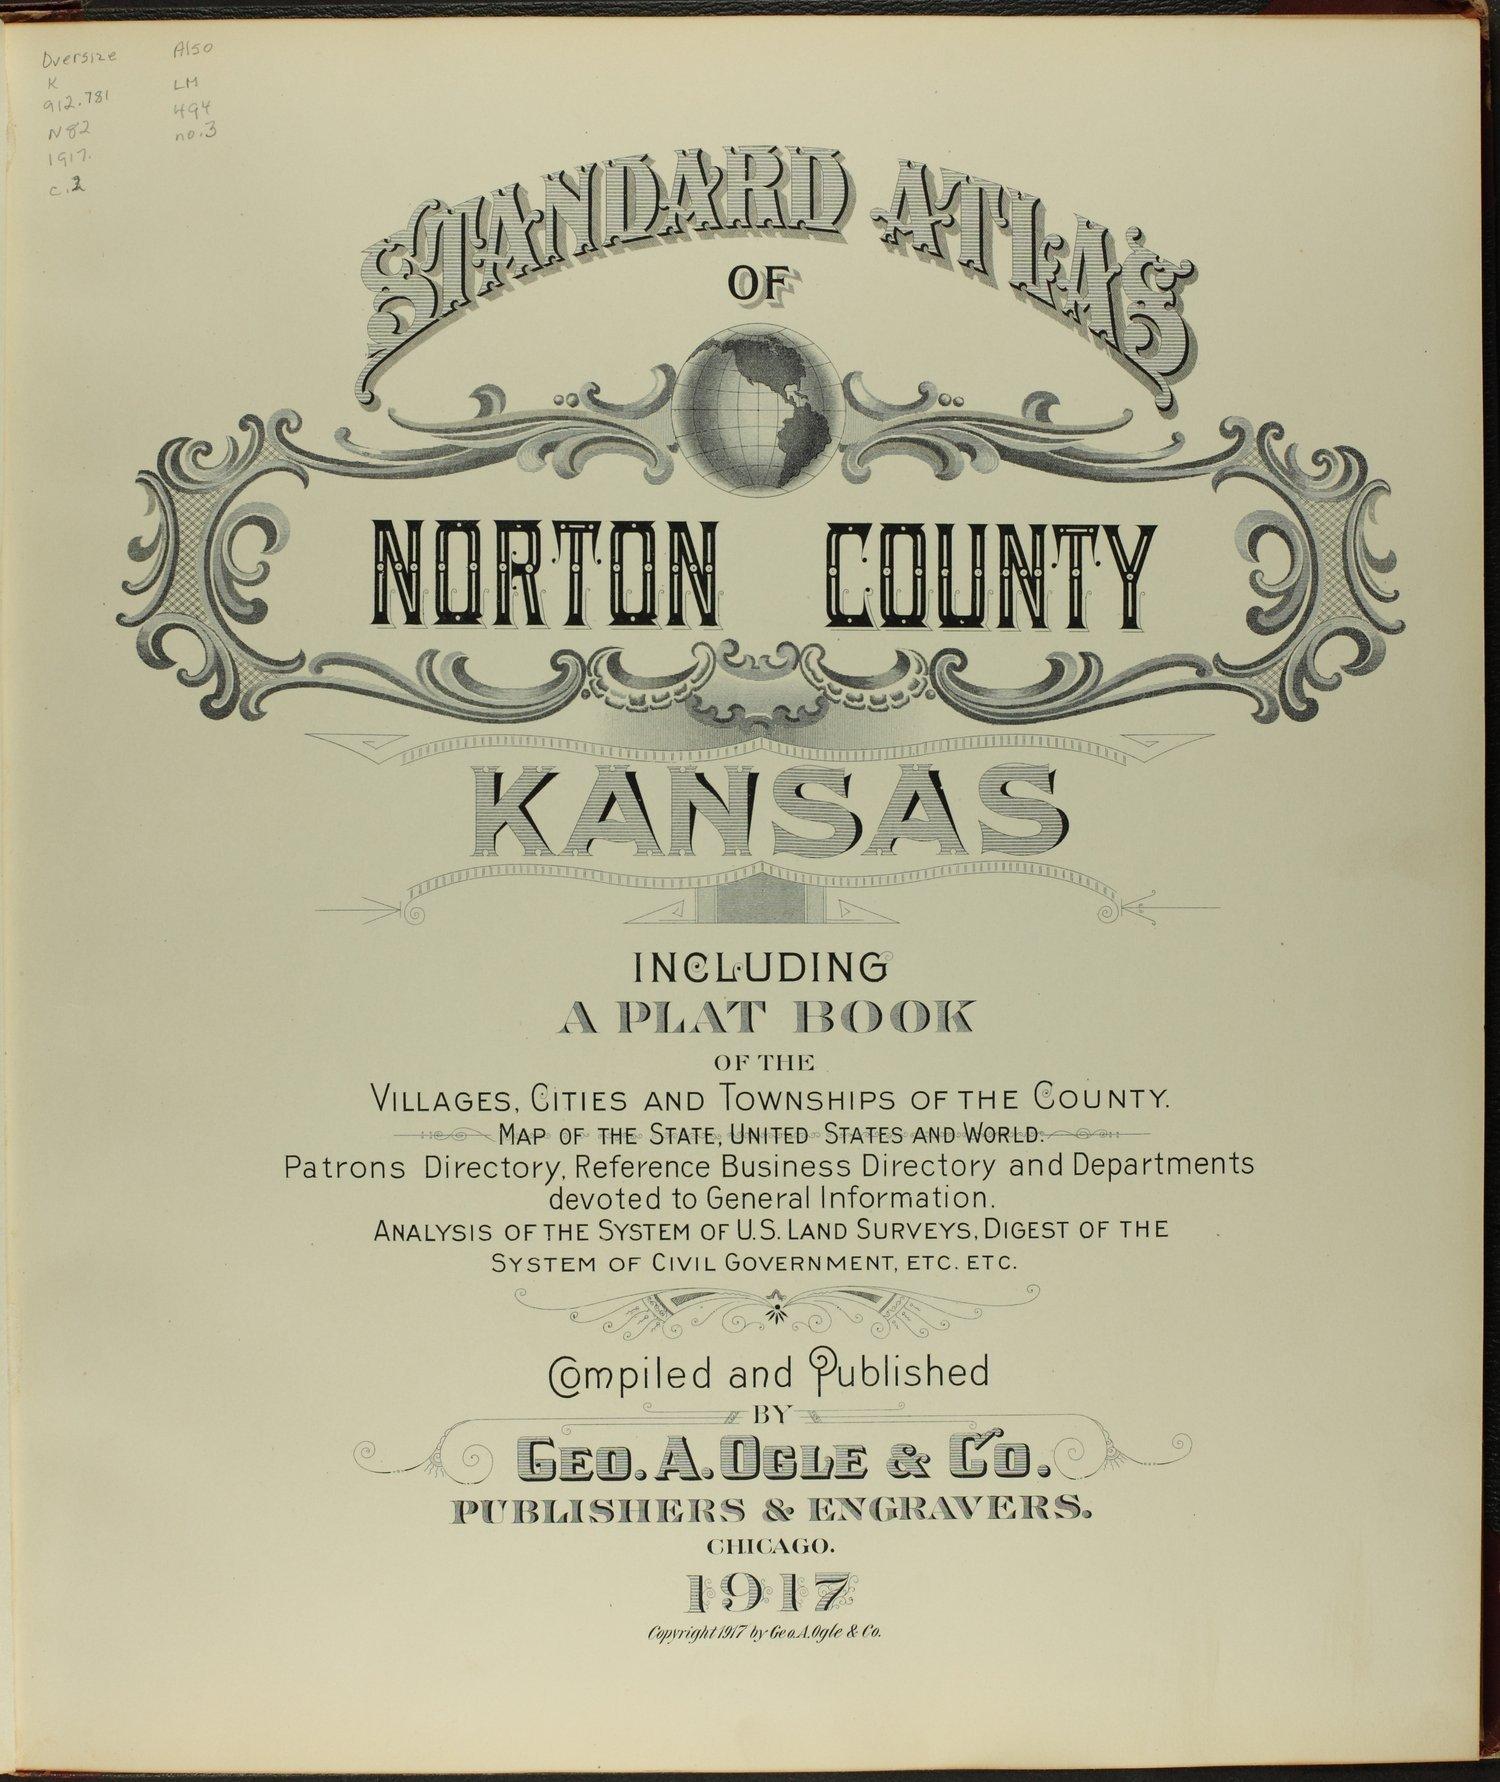 Standard atlas of Norton County, Kansas - Title Page